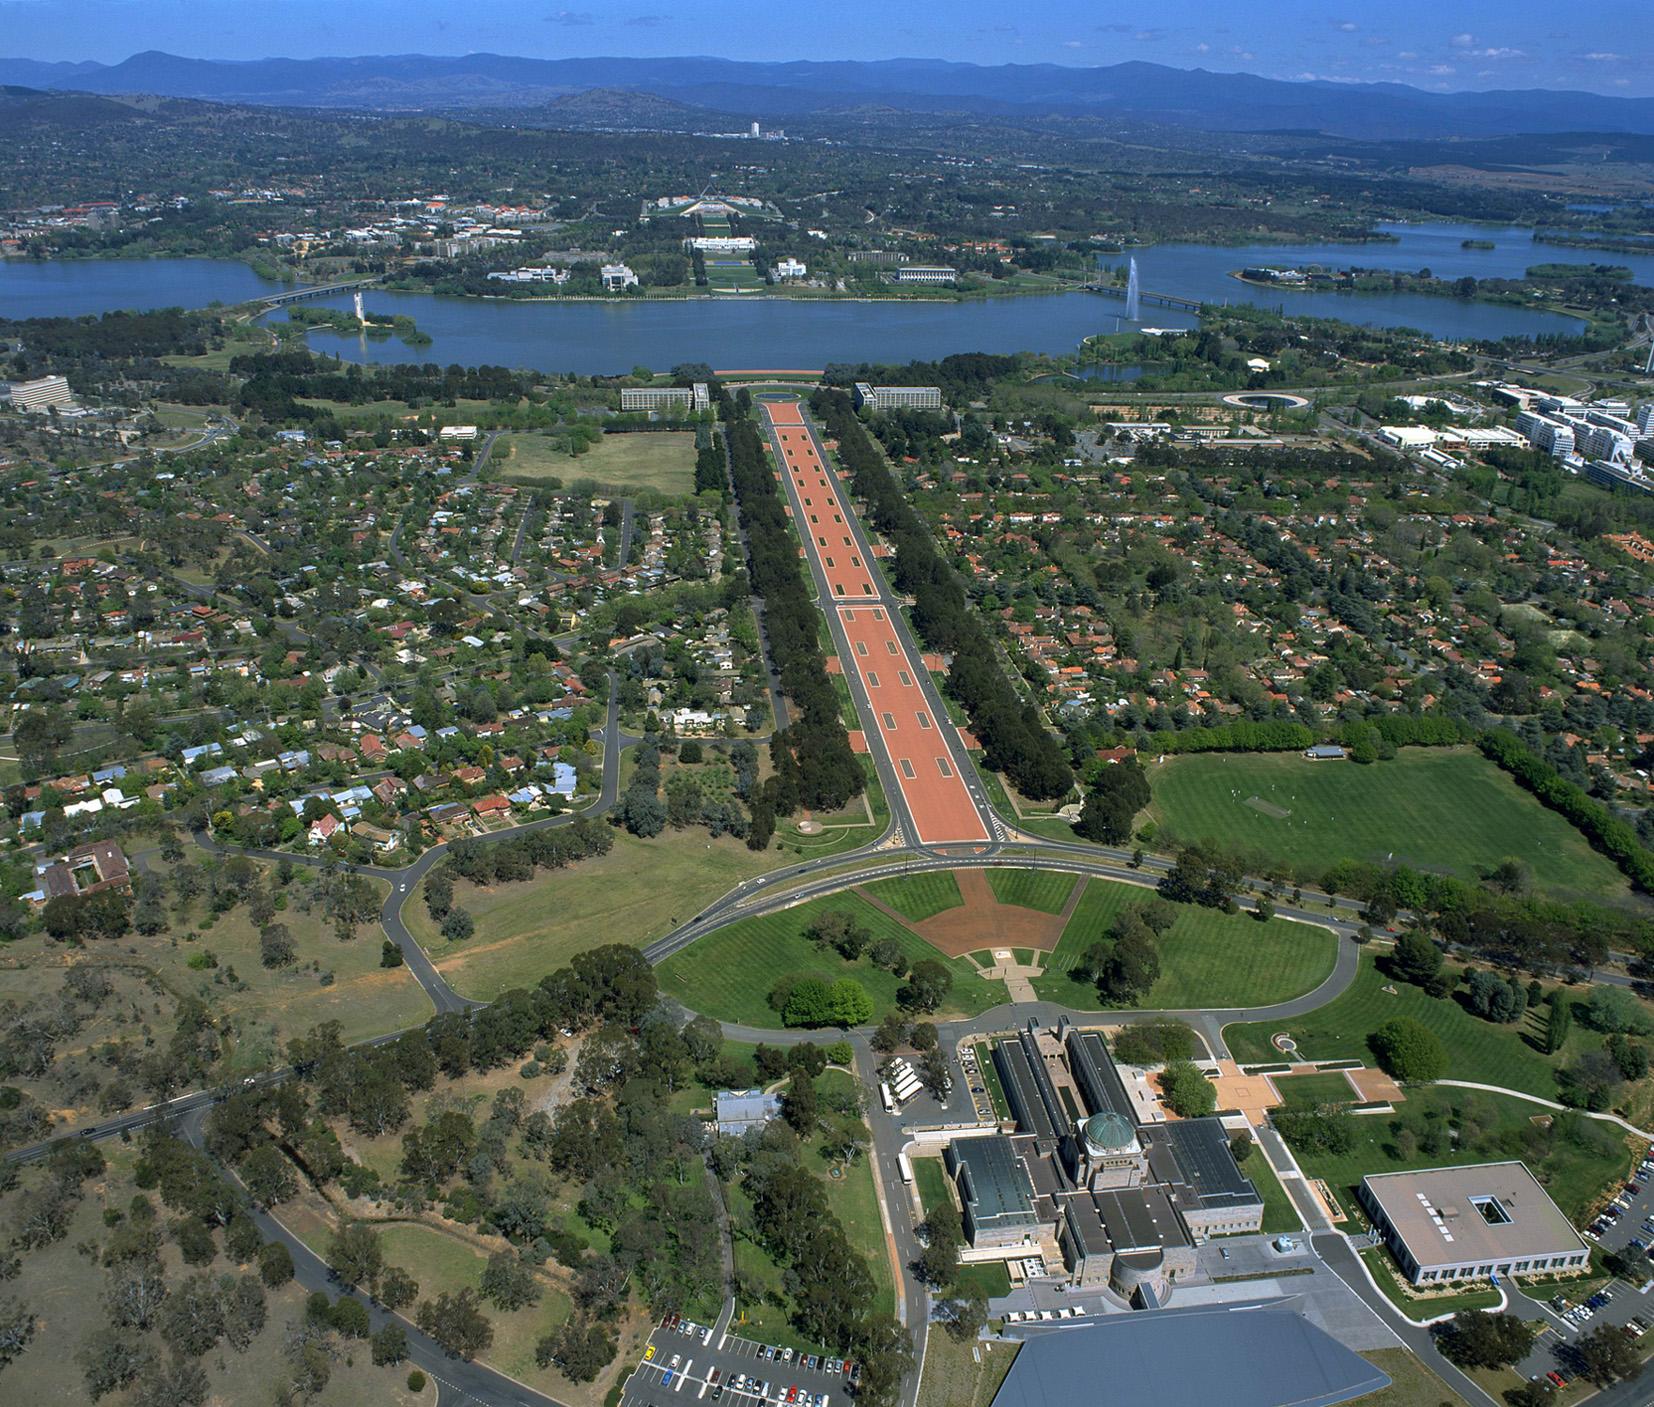 Canberra, Austalia